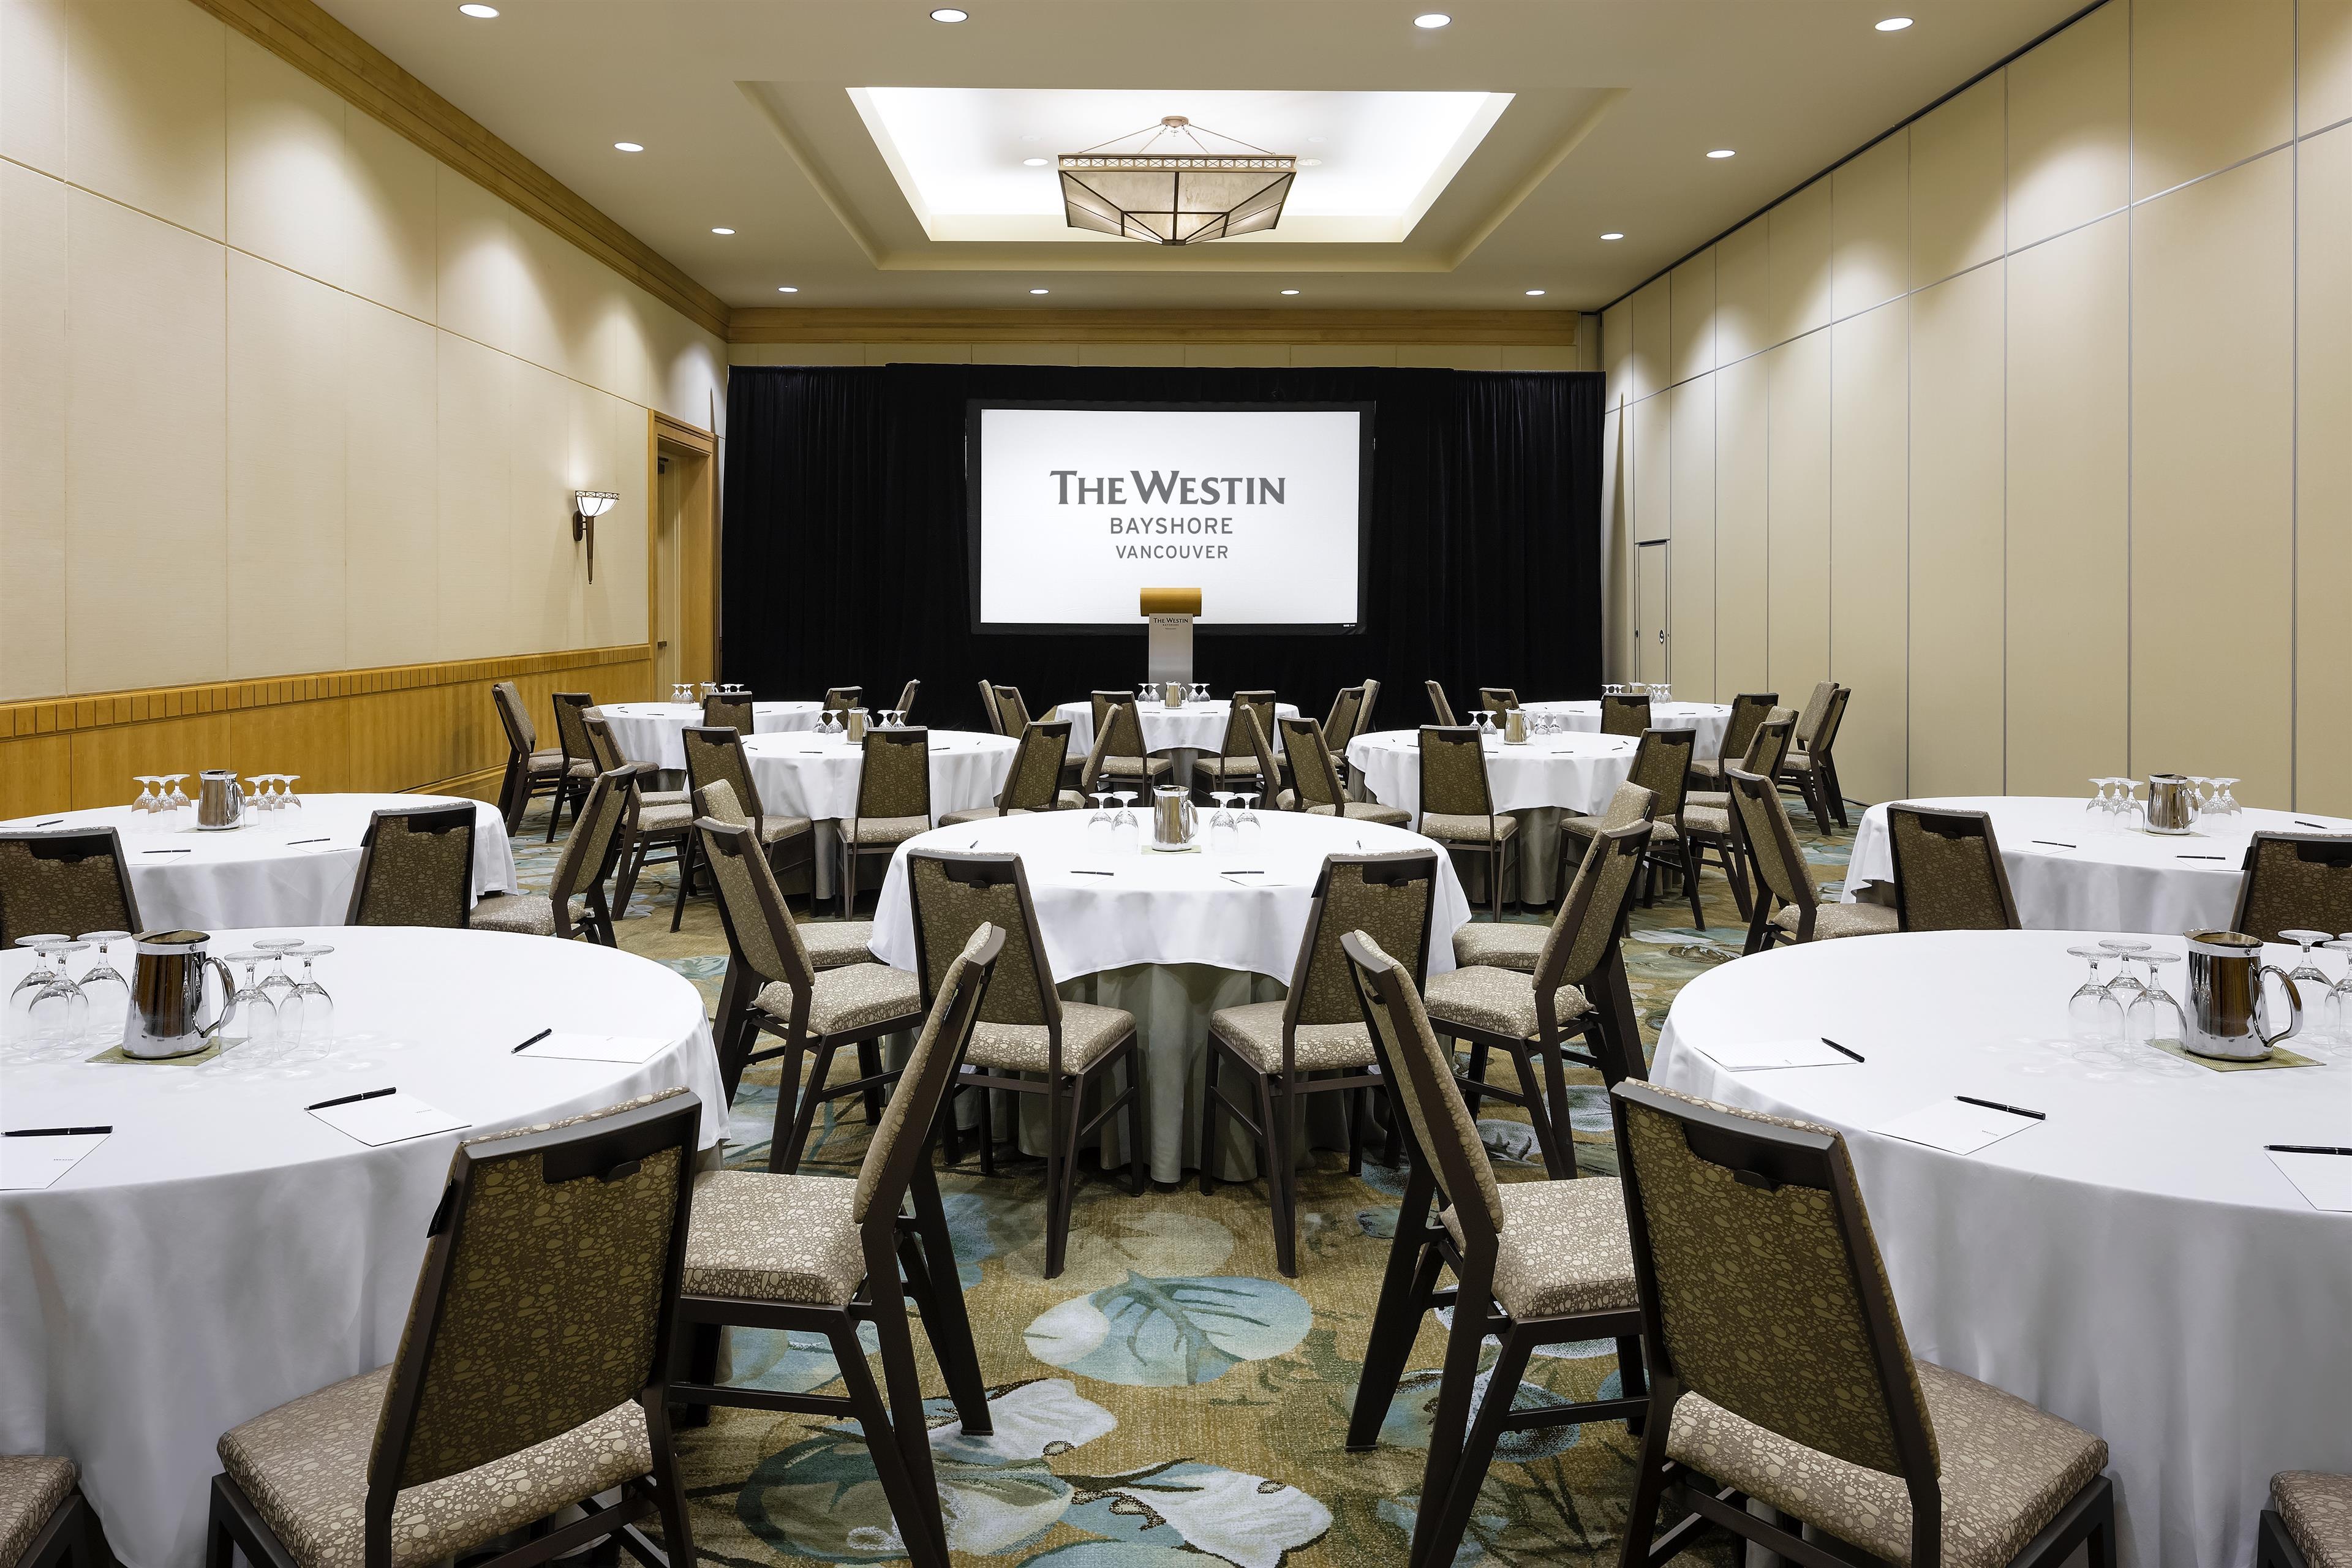 The Westin Bayshore, Vancouver in Vancouver: Salon 1 Half Rounds